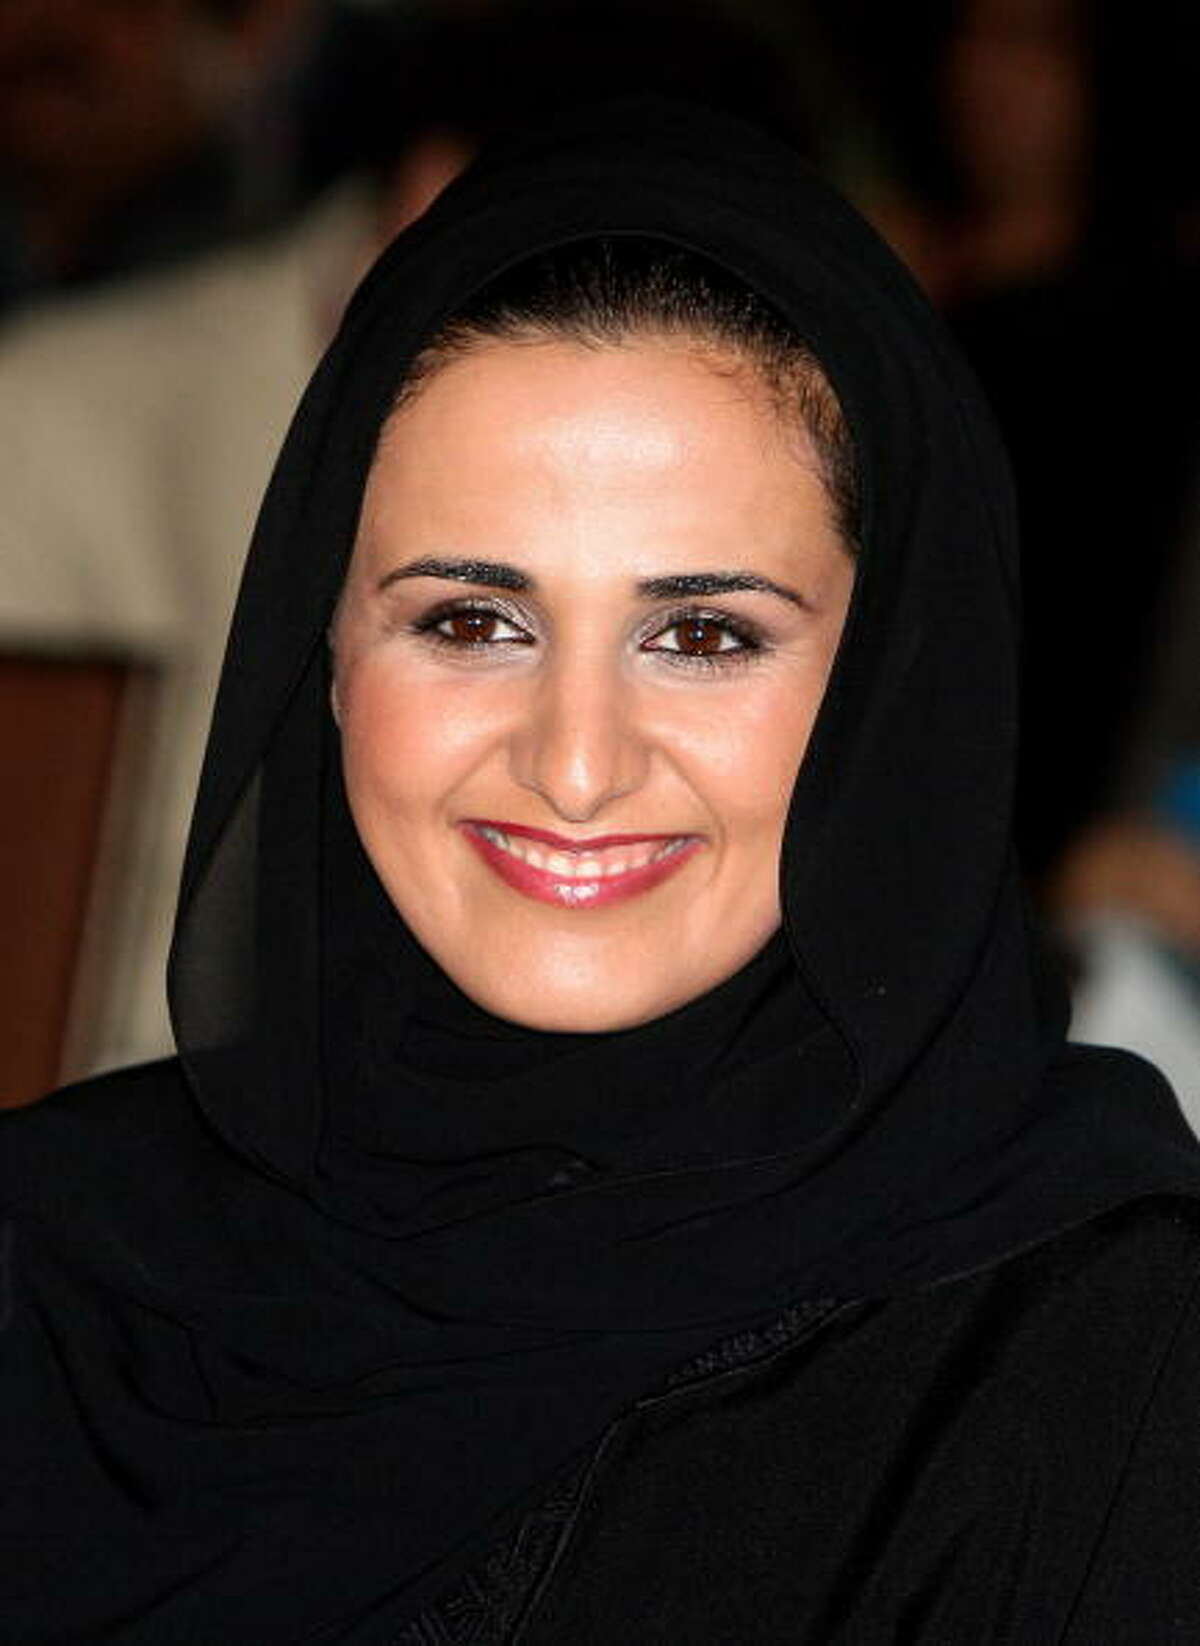 Sheikha Mayasssa Al Thani Art Collector / Art Dealer, Qatar. Source: forbes.com